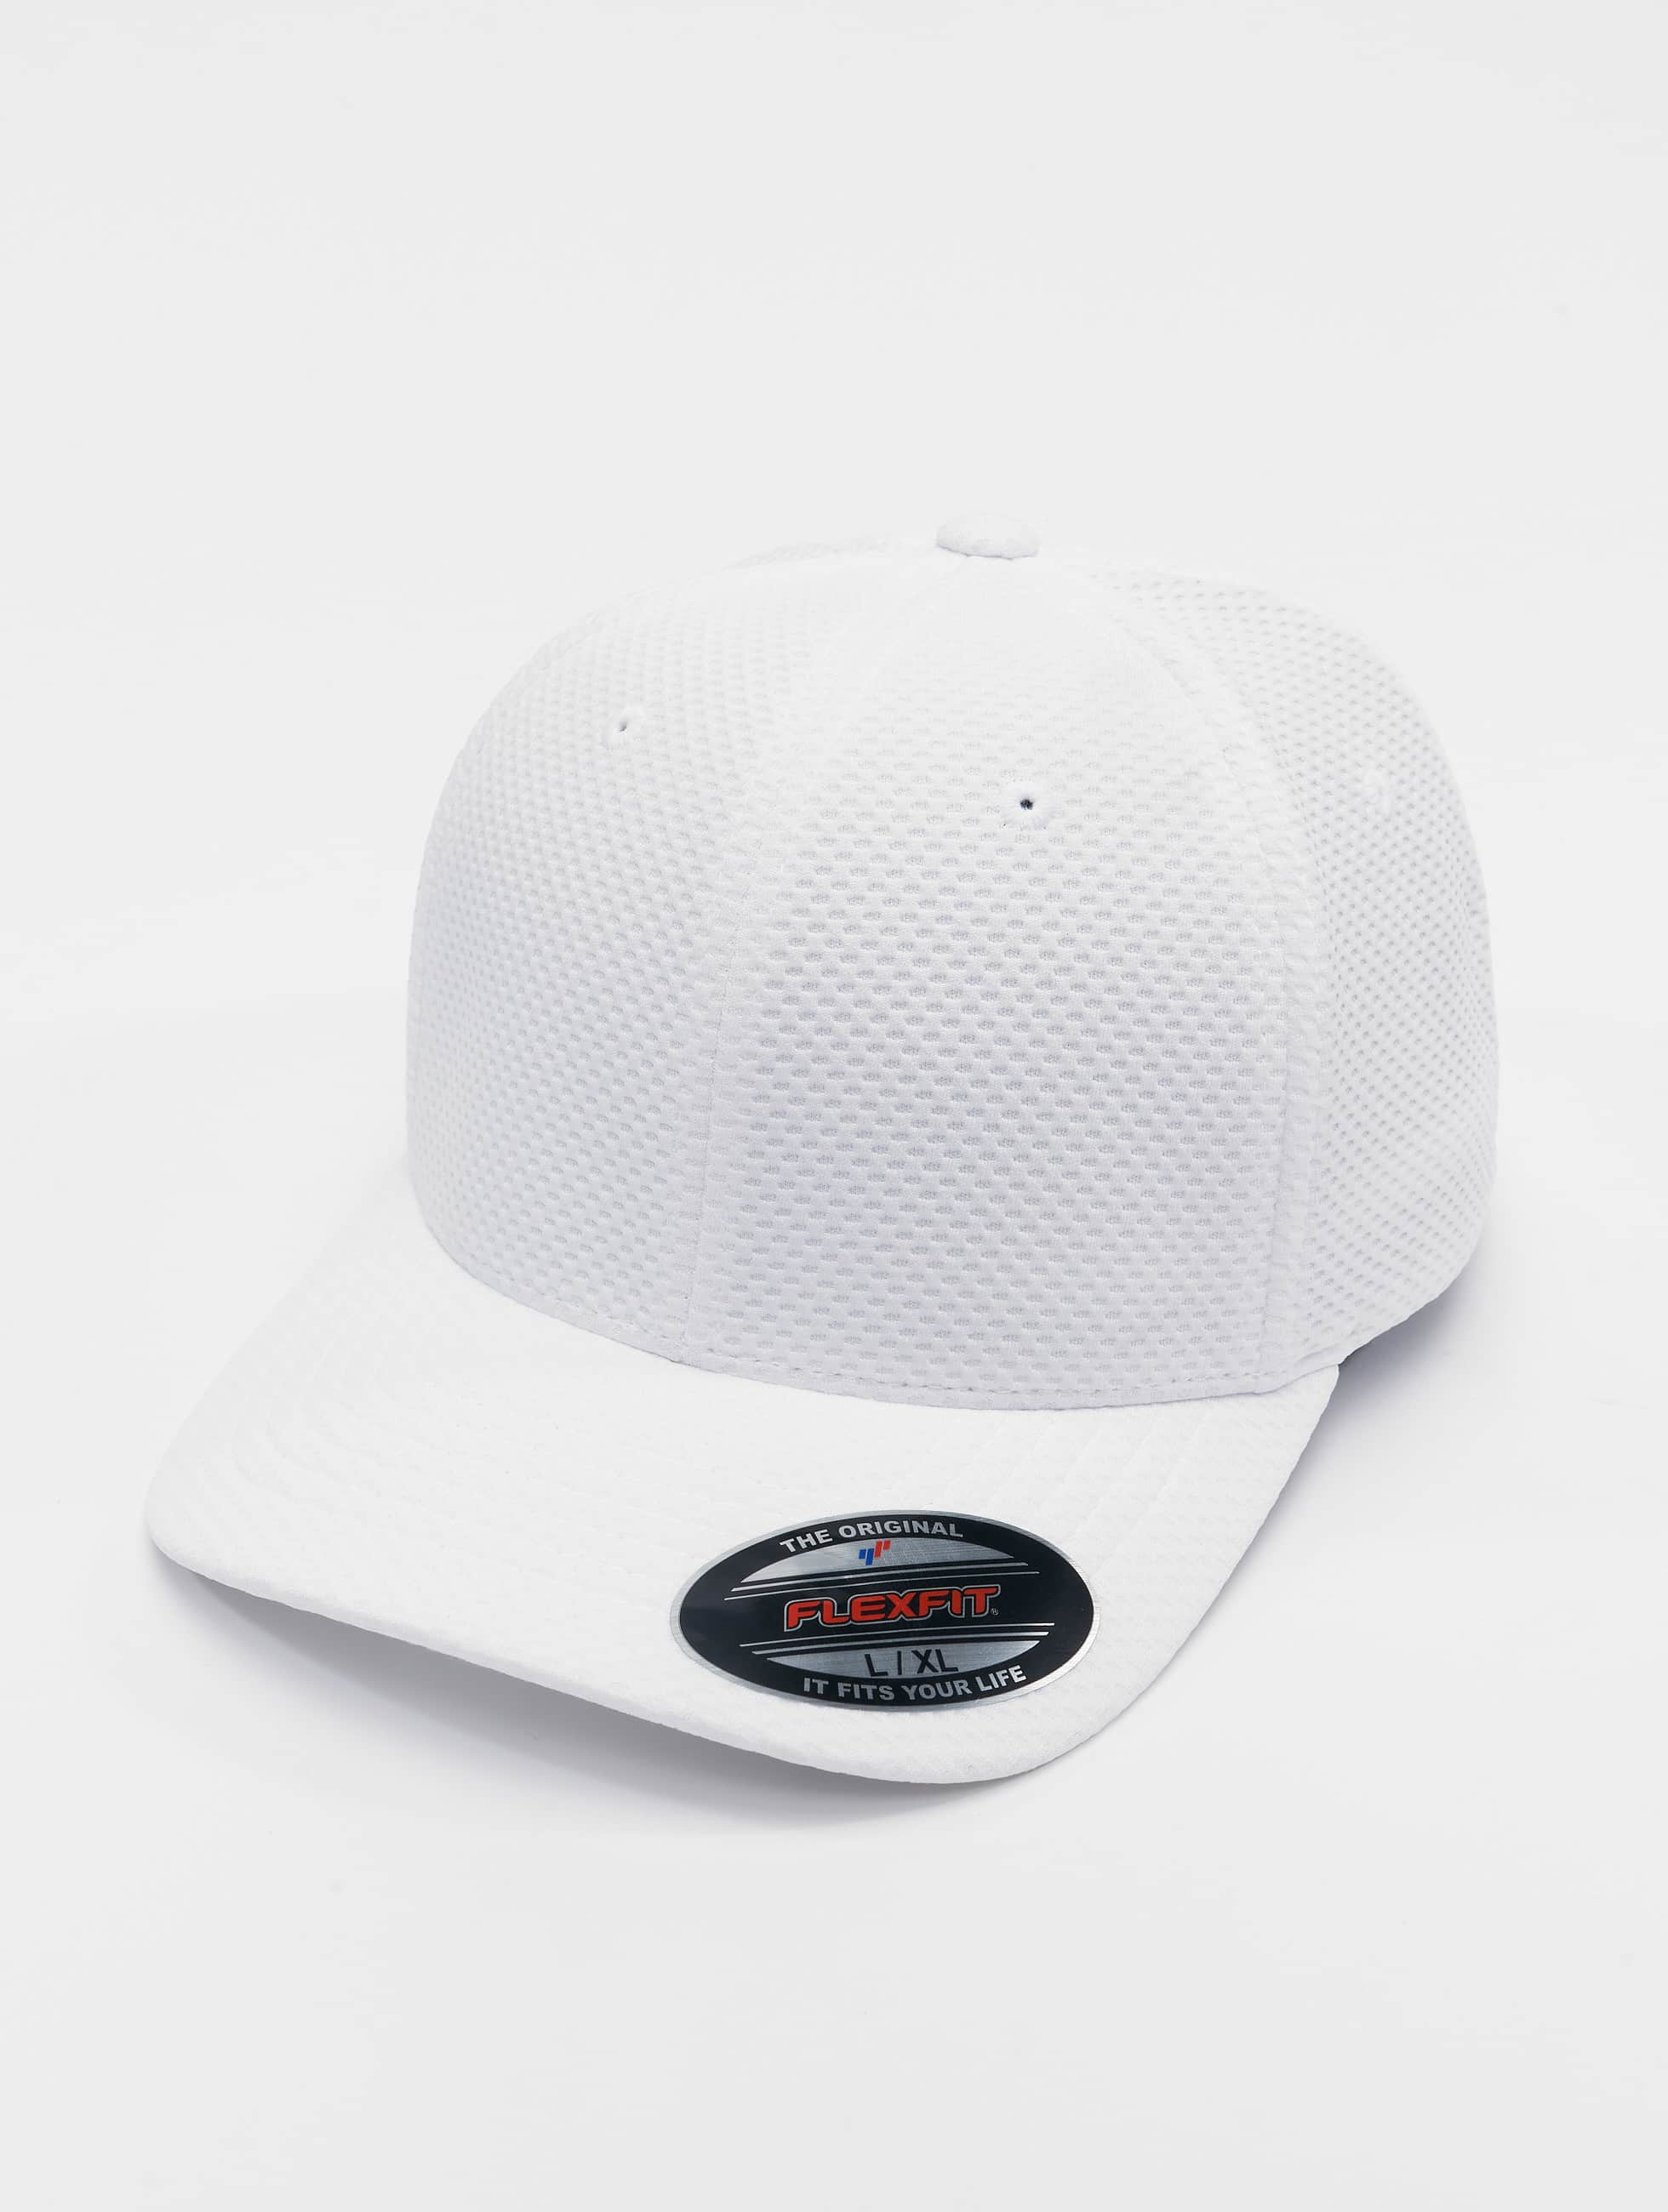 Flexfit Gorras Flexfitted 3D Hexagon blanco